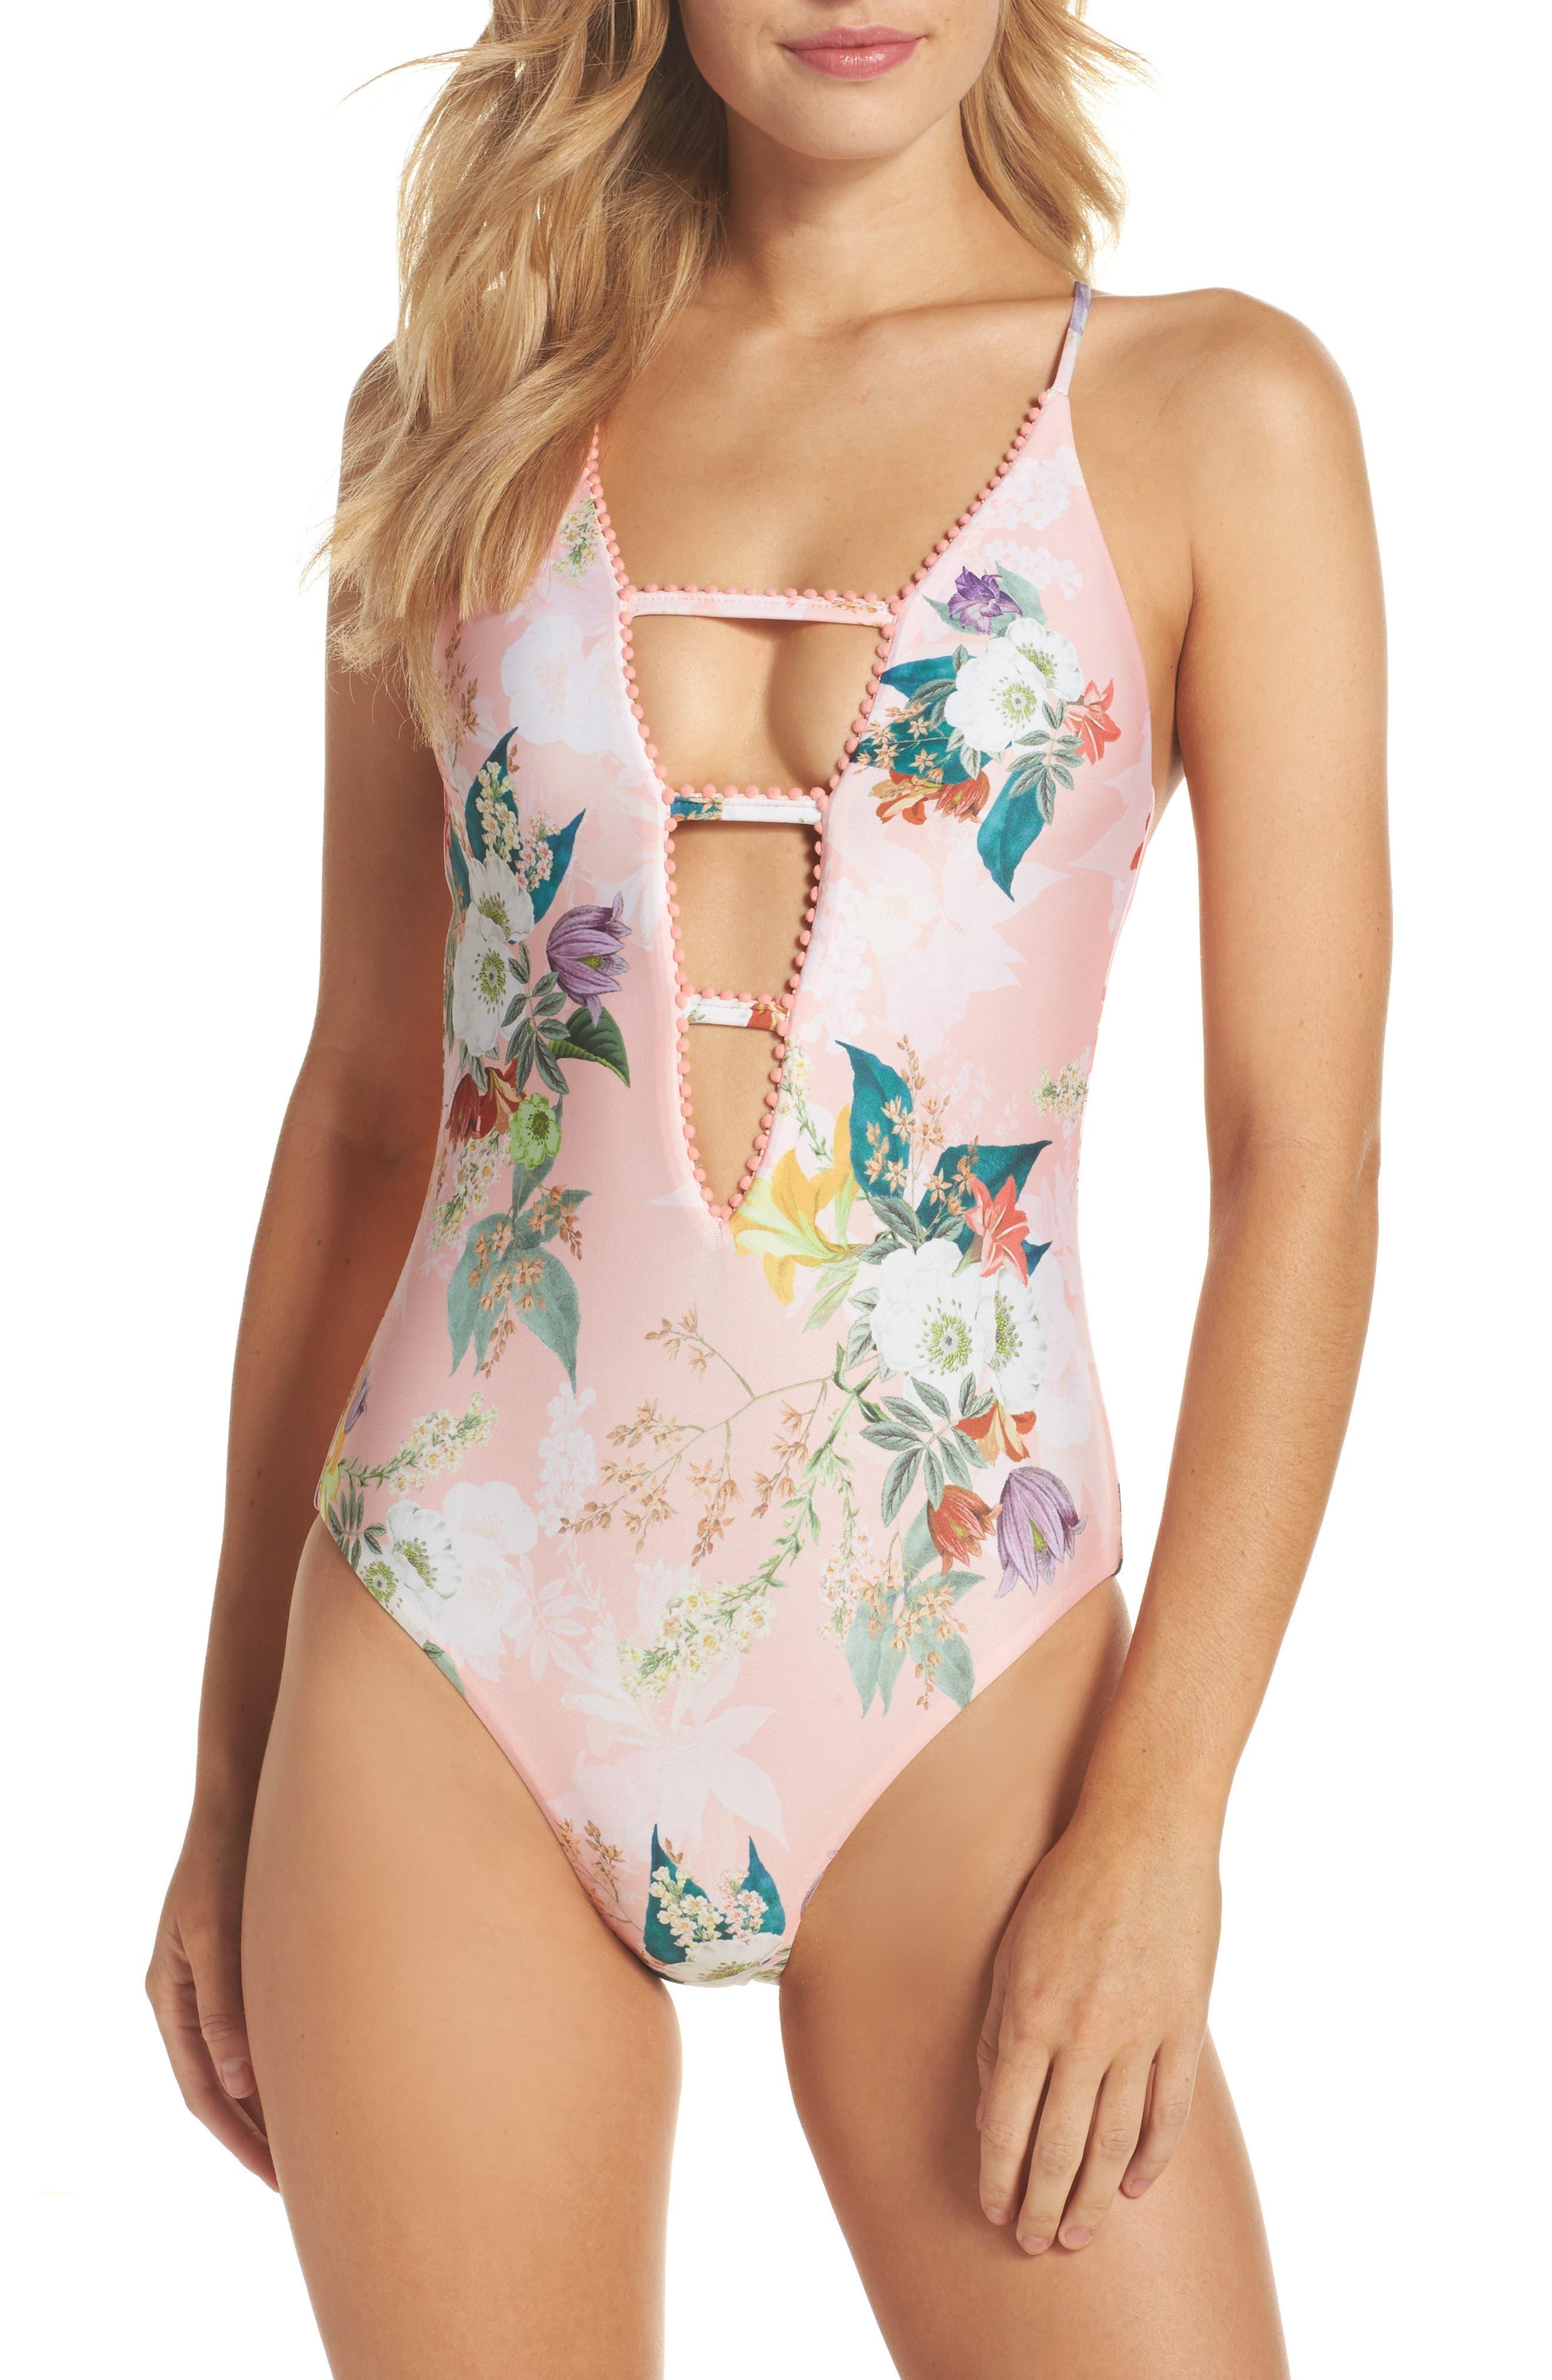 Blossoms Plunge One-Piece Swimsuit,                             Main thumbnail 1, color,                             950